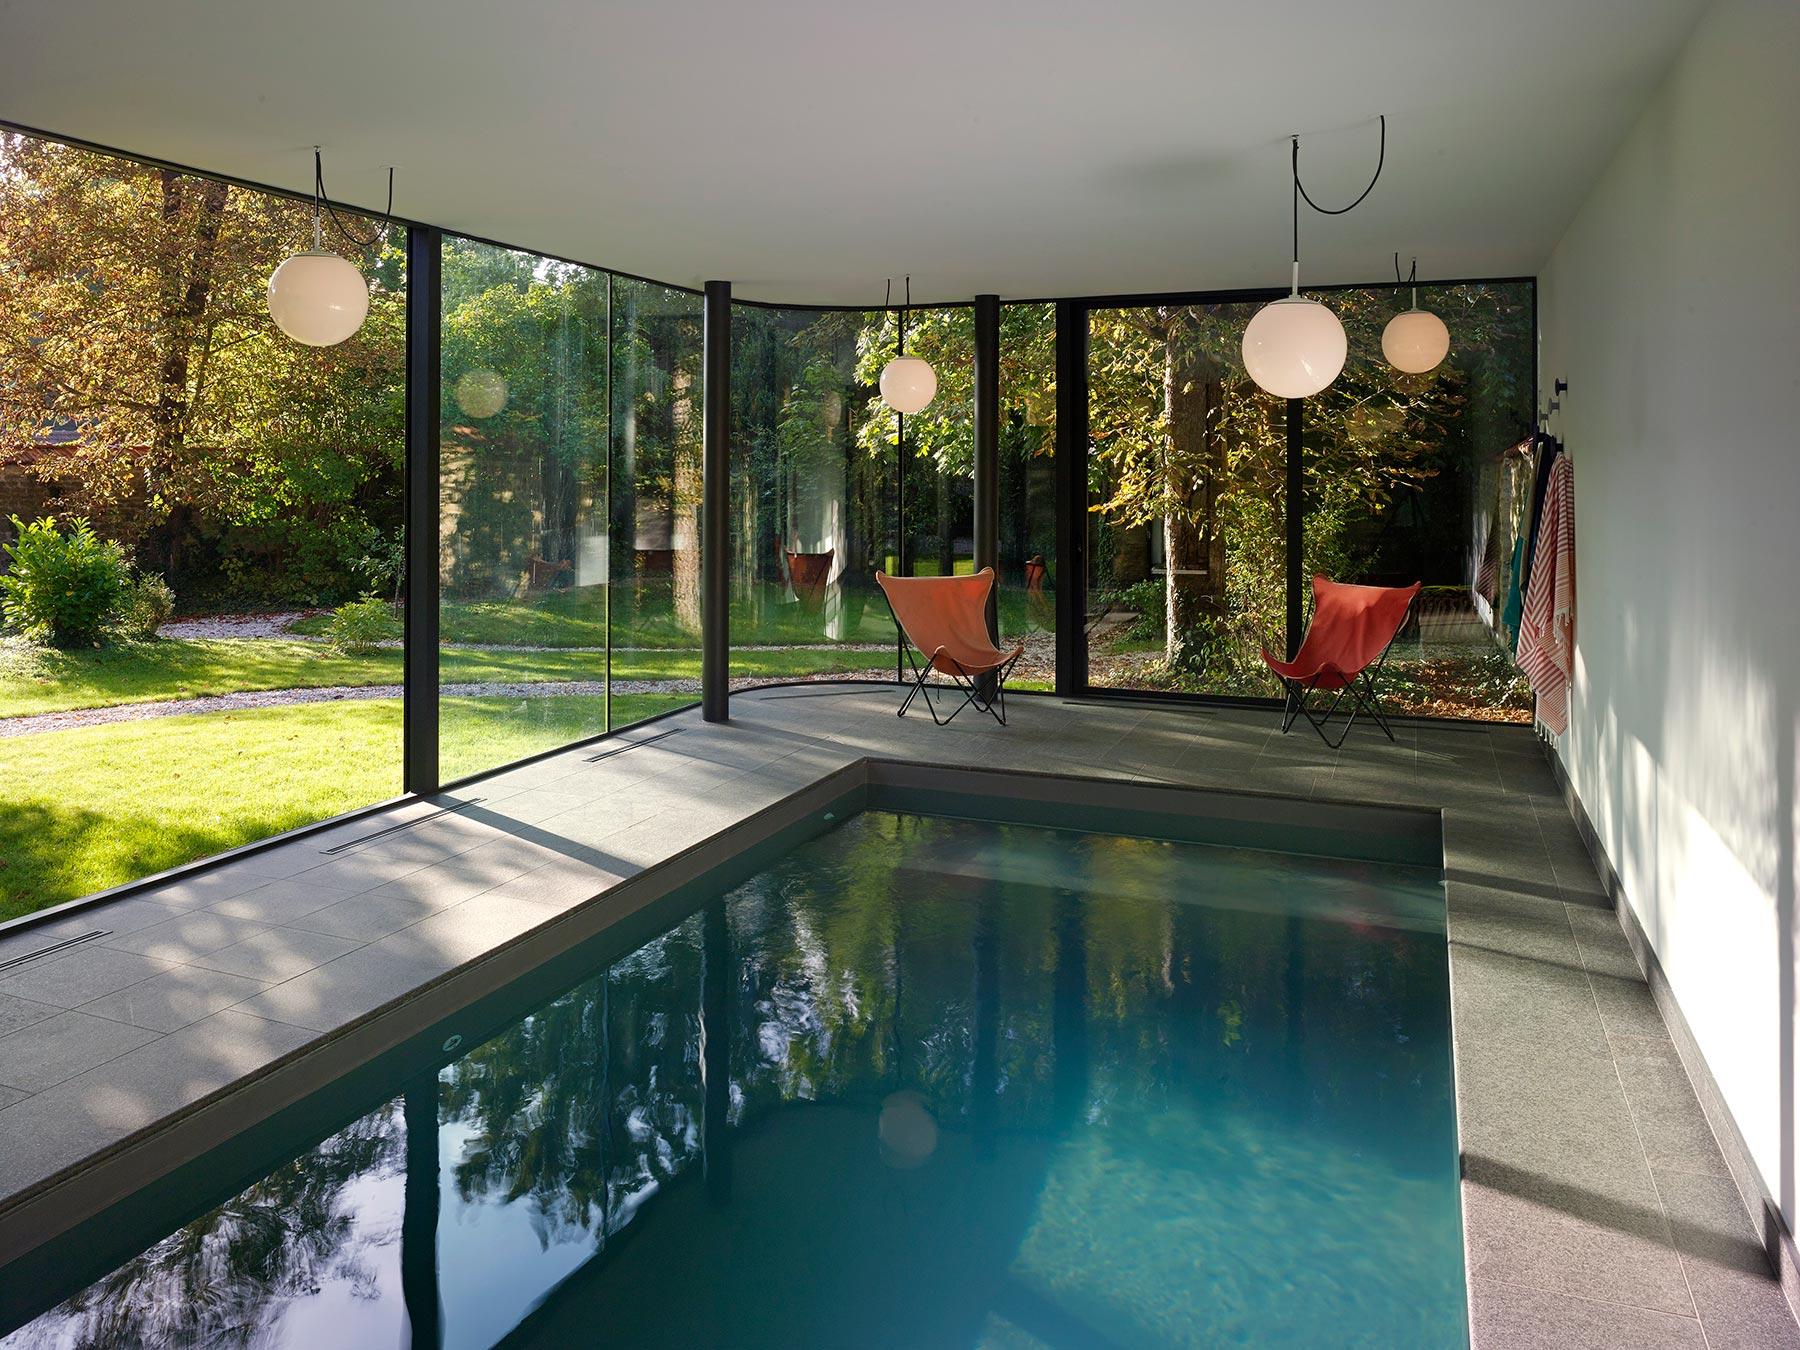 colomes-nomdedeu-extension-piscine-8